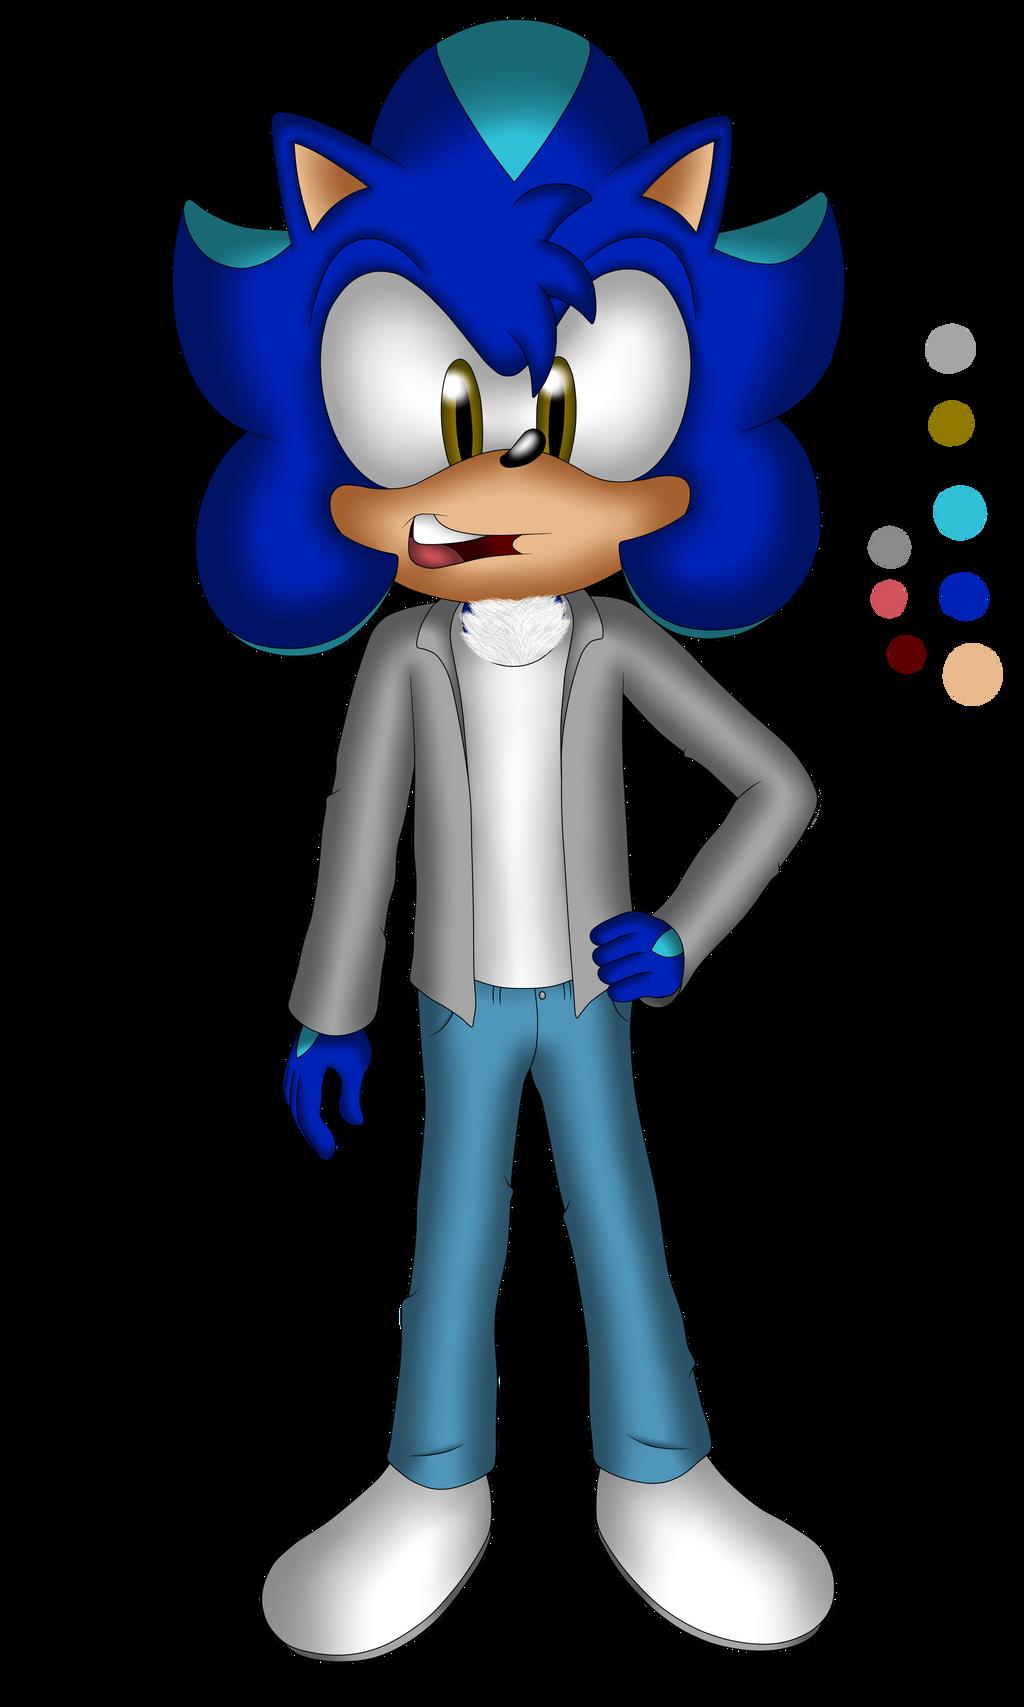 StefanTheHedgehog's Profile Picture